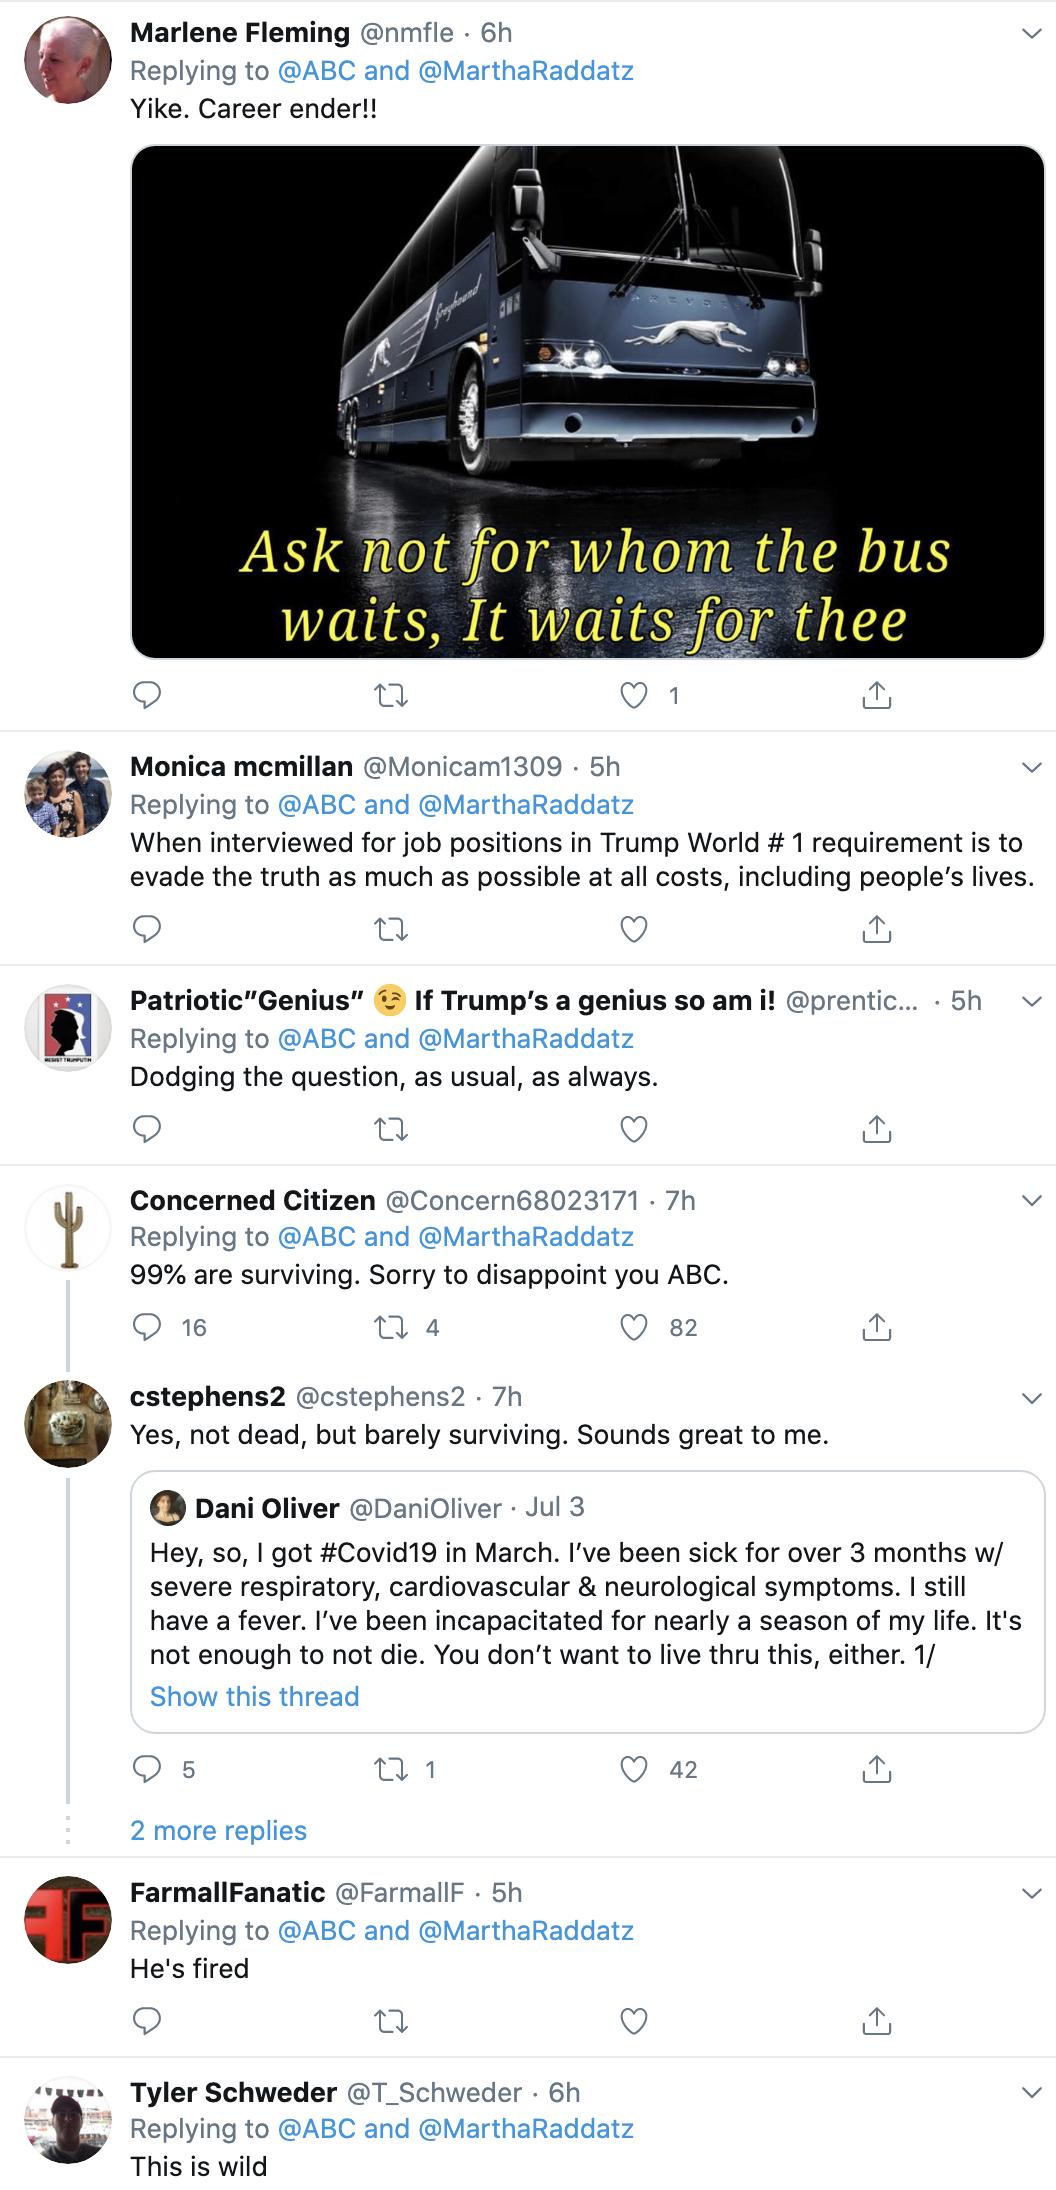 Screen-Shot-2020-07-05-at-4.52.56-PM Coronavirus Taskforce Commissioner Breaks With Trump Over Lie Coronavirus Election 2020 Featured Politics Top Stories